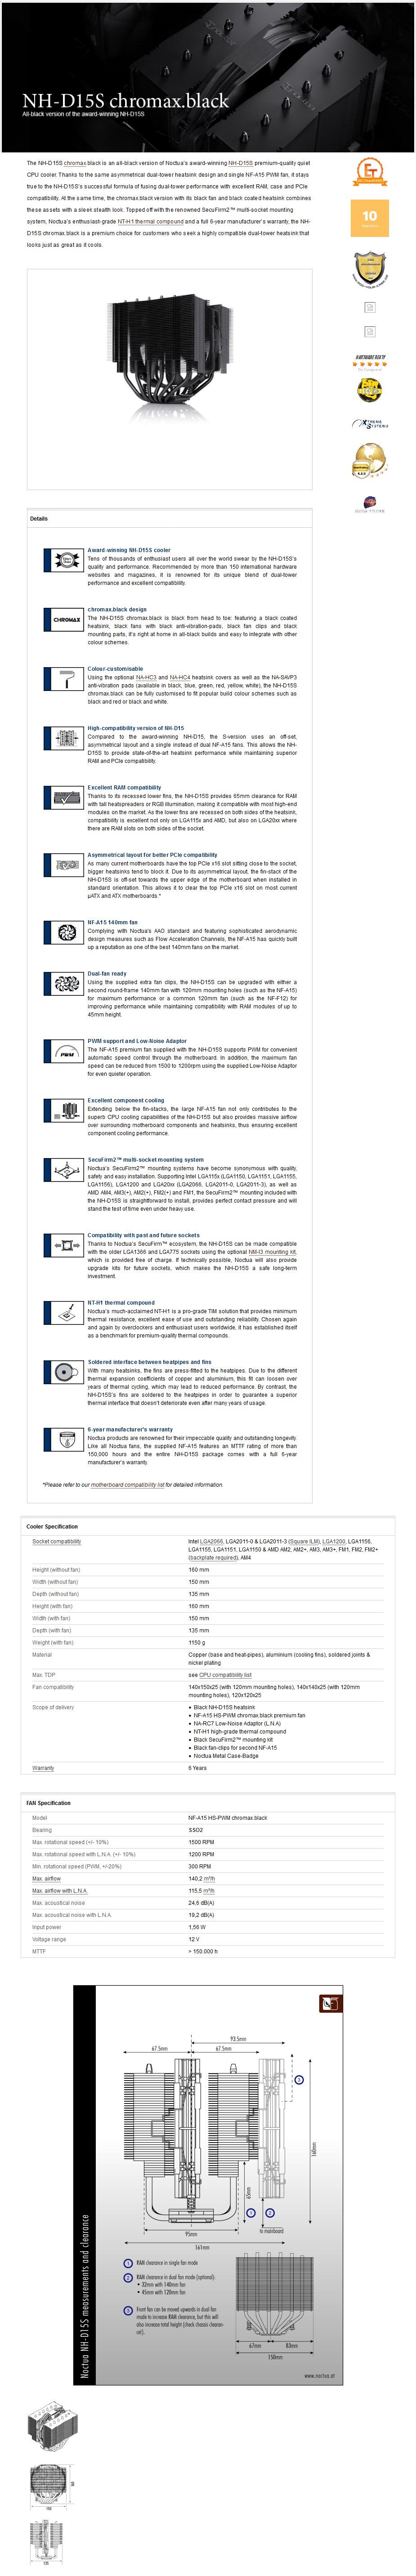 Noctua NH-D15S Multi-Socket PWM CPU Cooler - Chromax Black - Overview 1